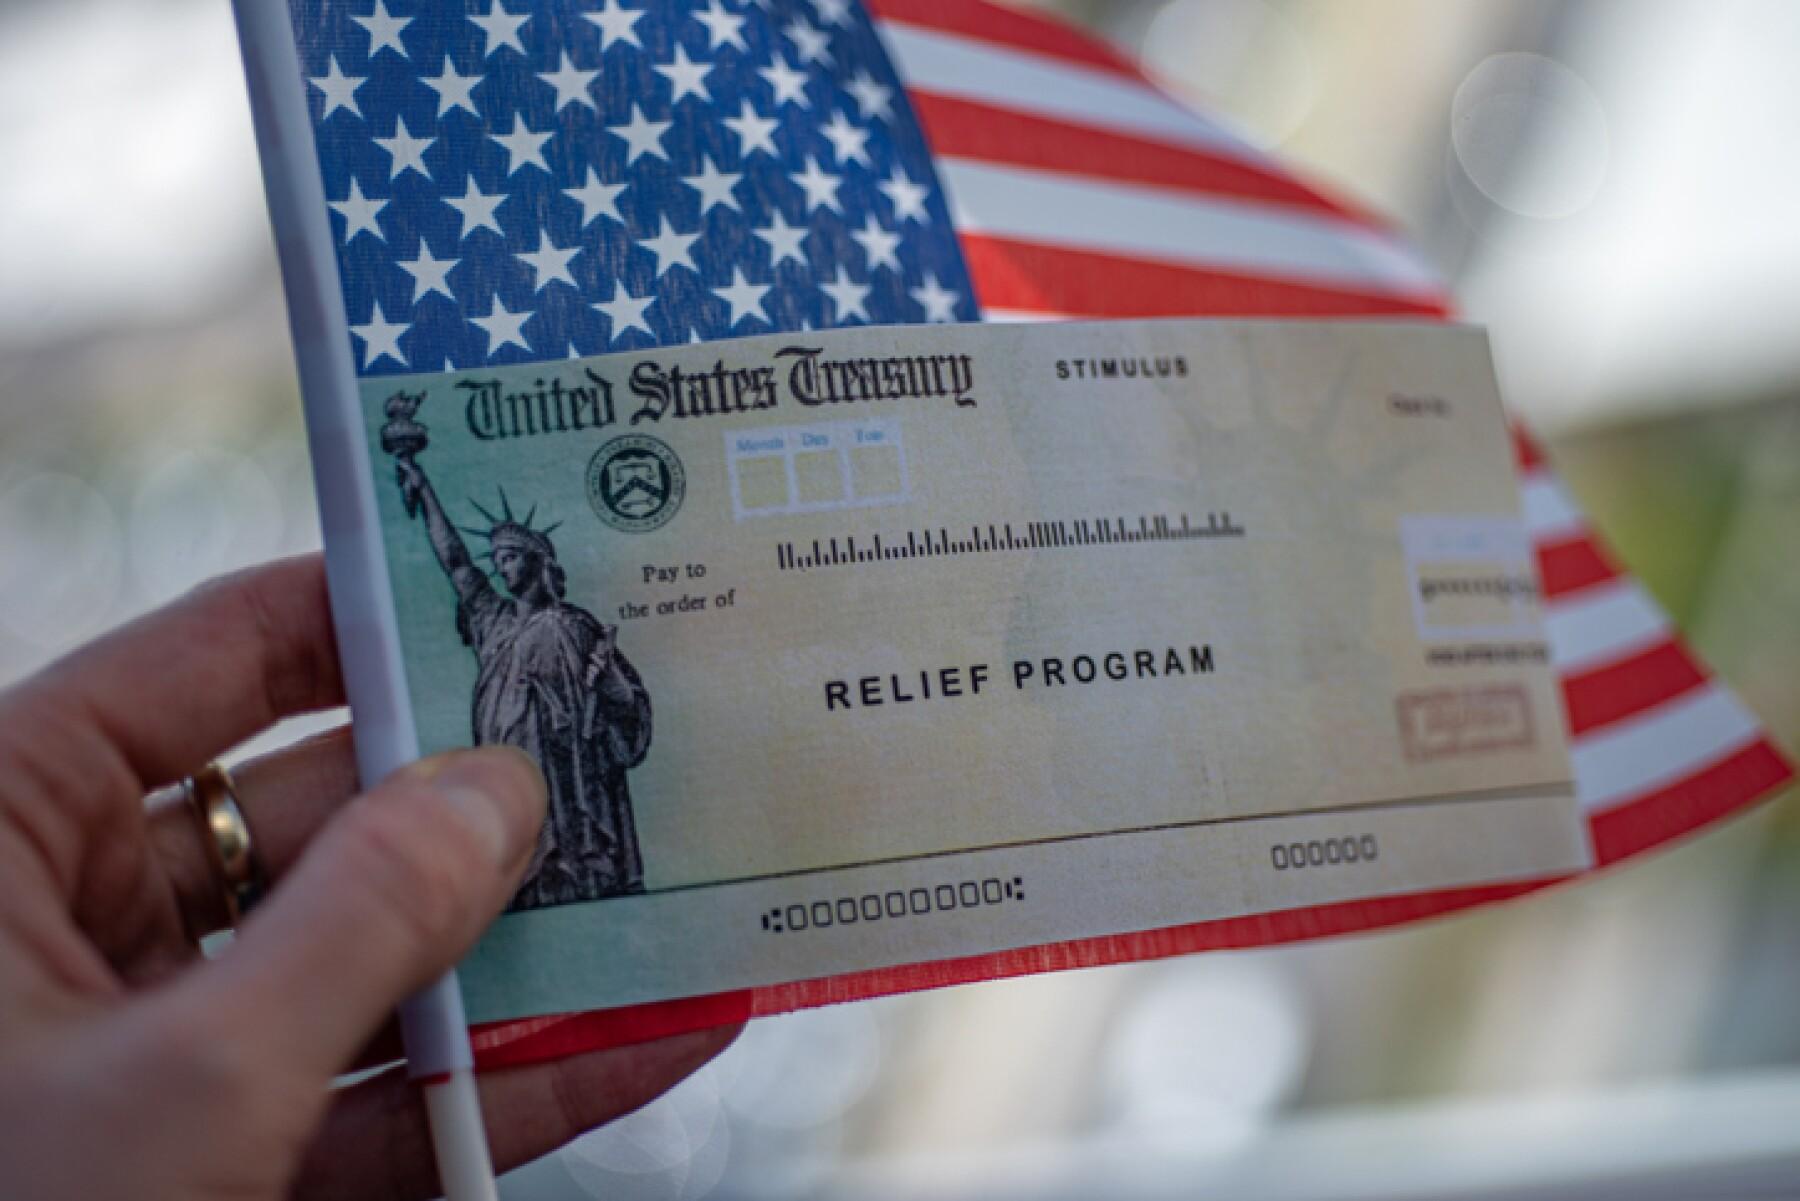 COVID-19 economic Stimulus check on blurred USA flag background. Relief program concept.